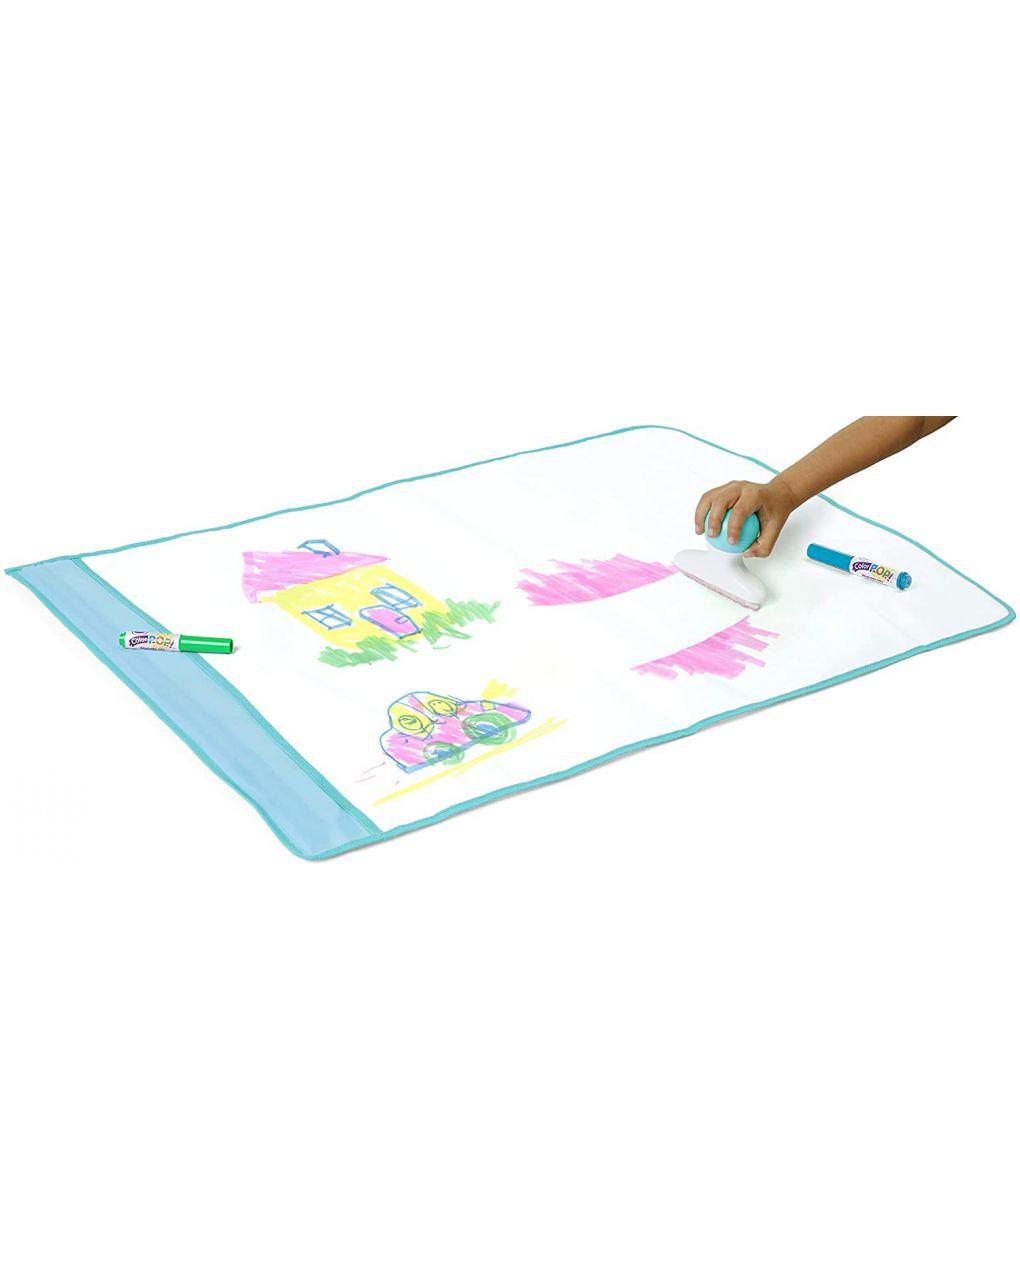 Crayola - tapete para colorir e recolorir - Crayola